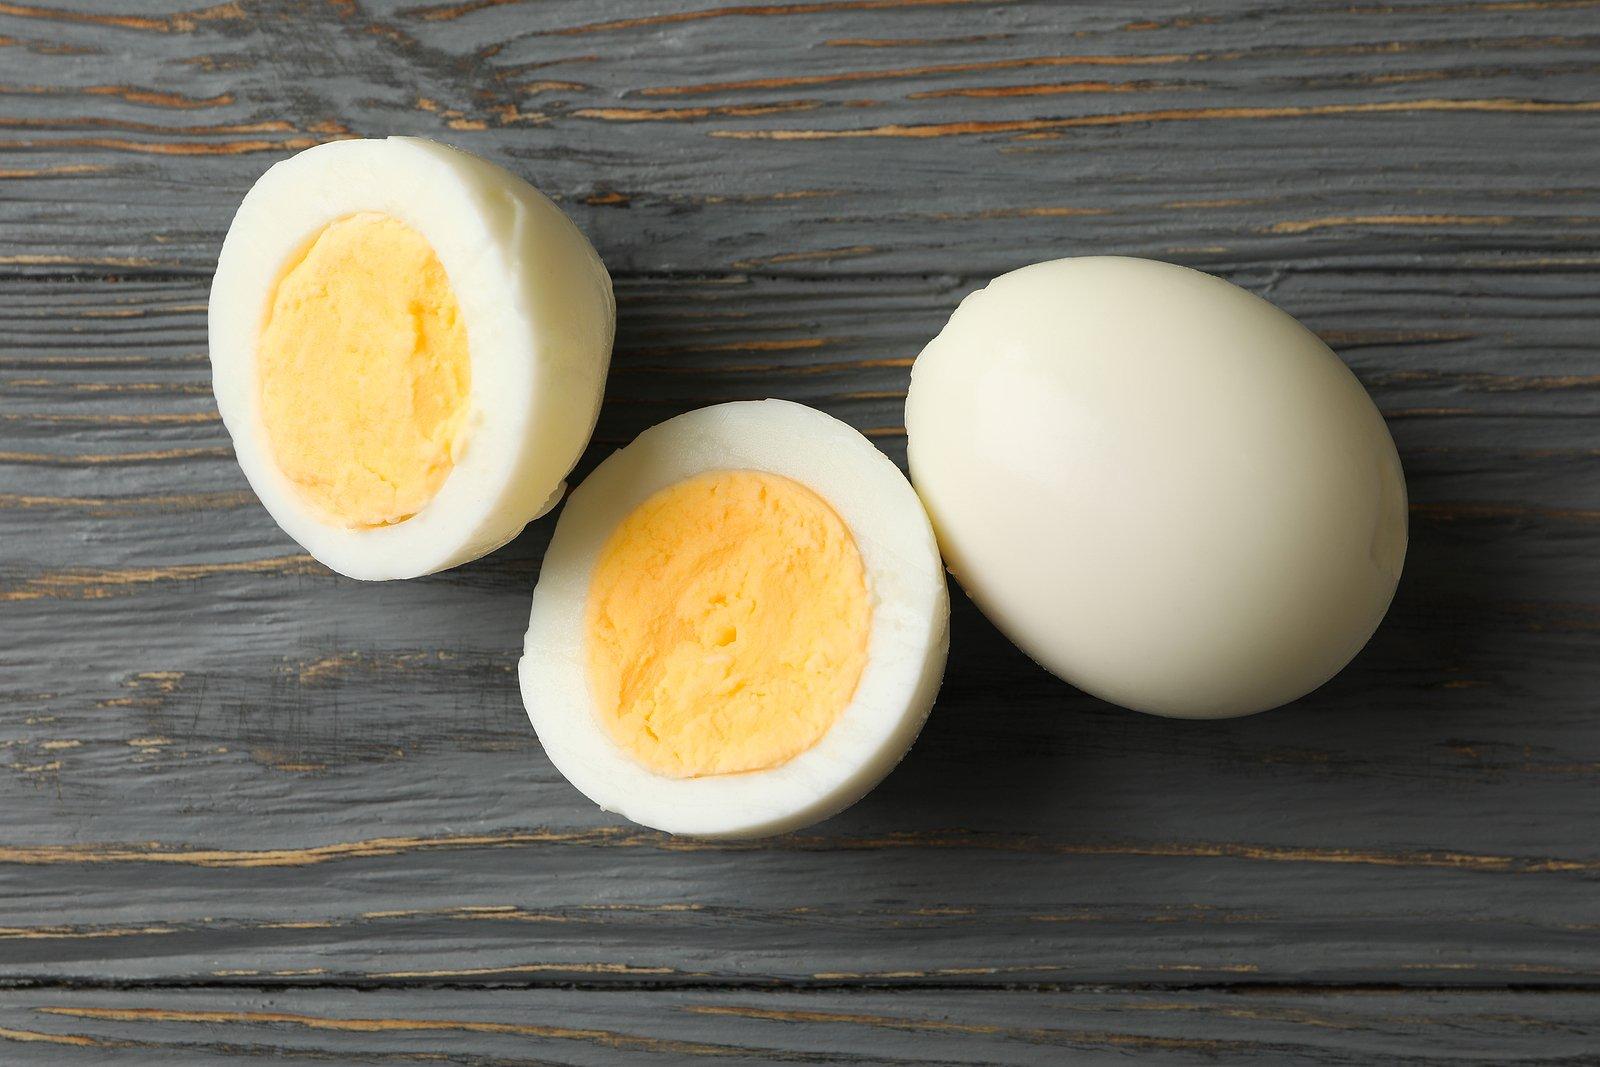 bigstock-Hard-Boiled-Eggs-On-Wooden-Bac-392051996